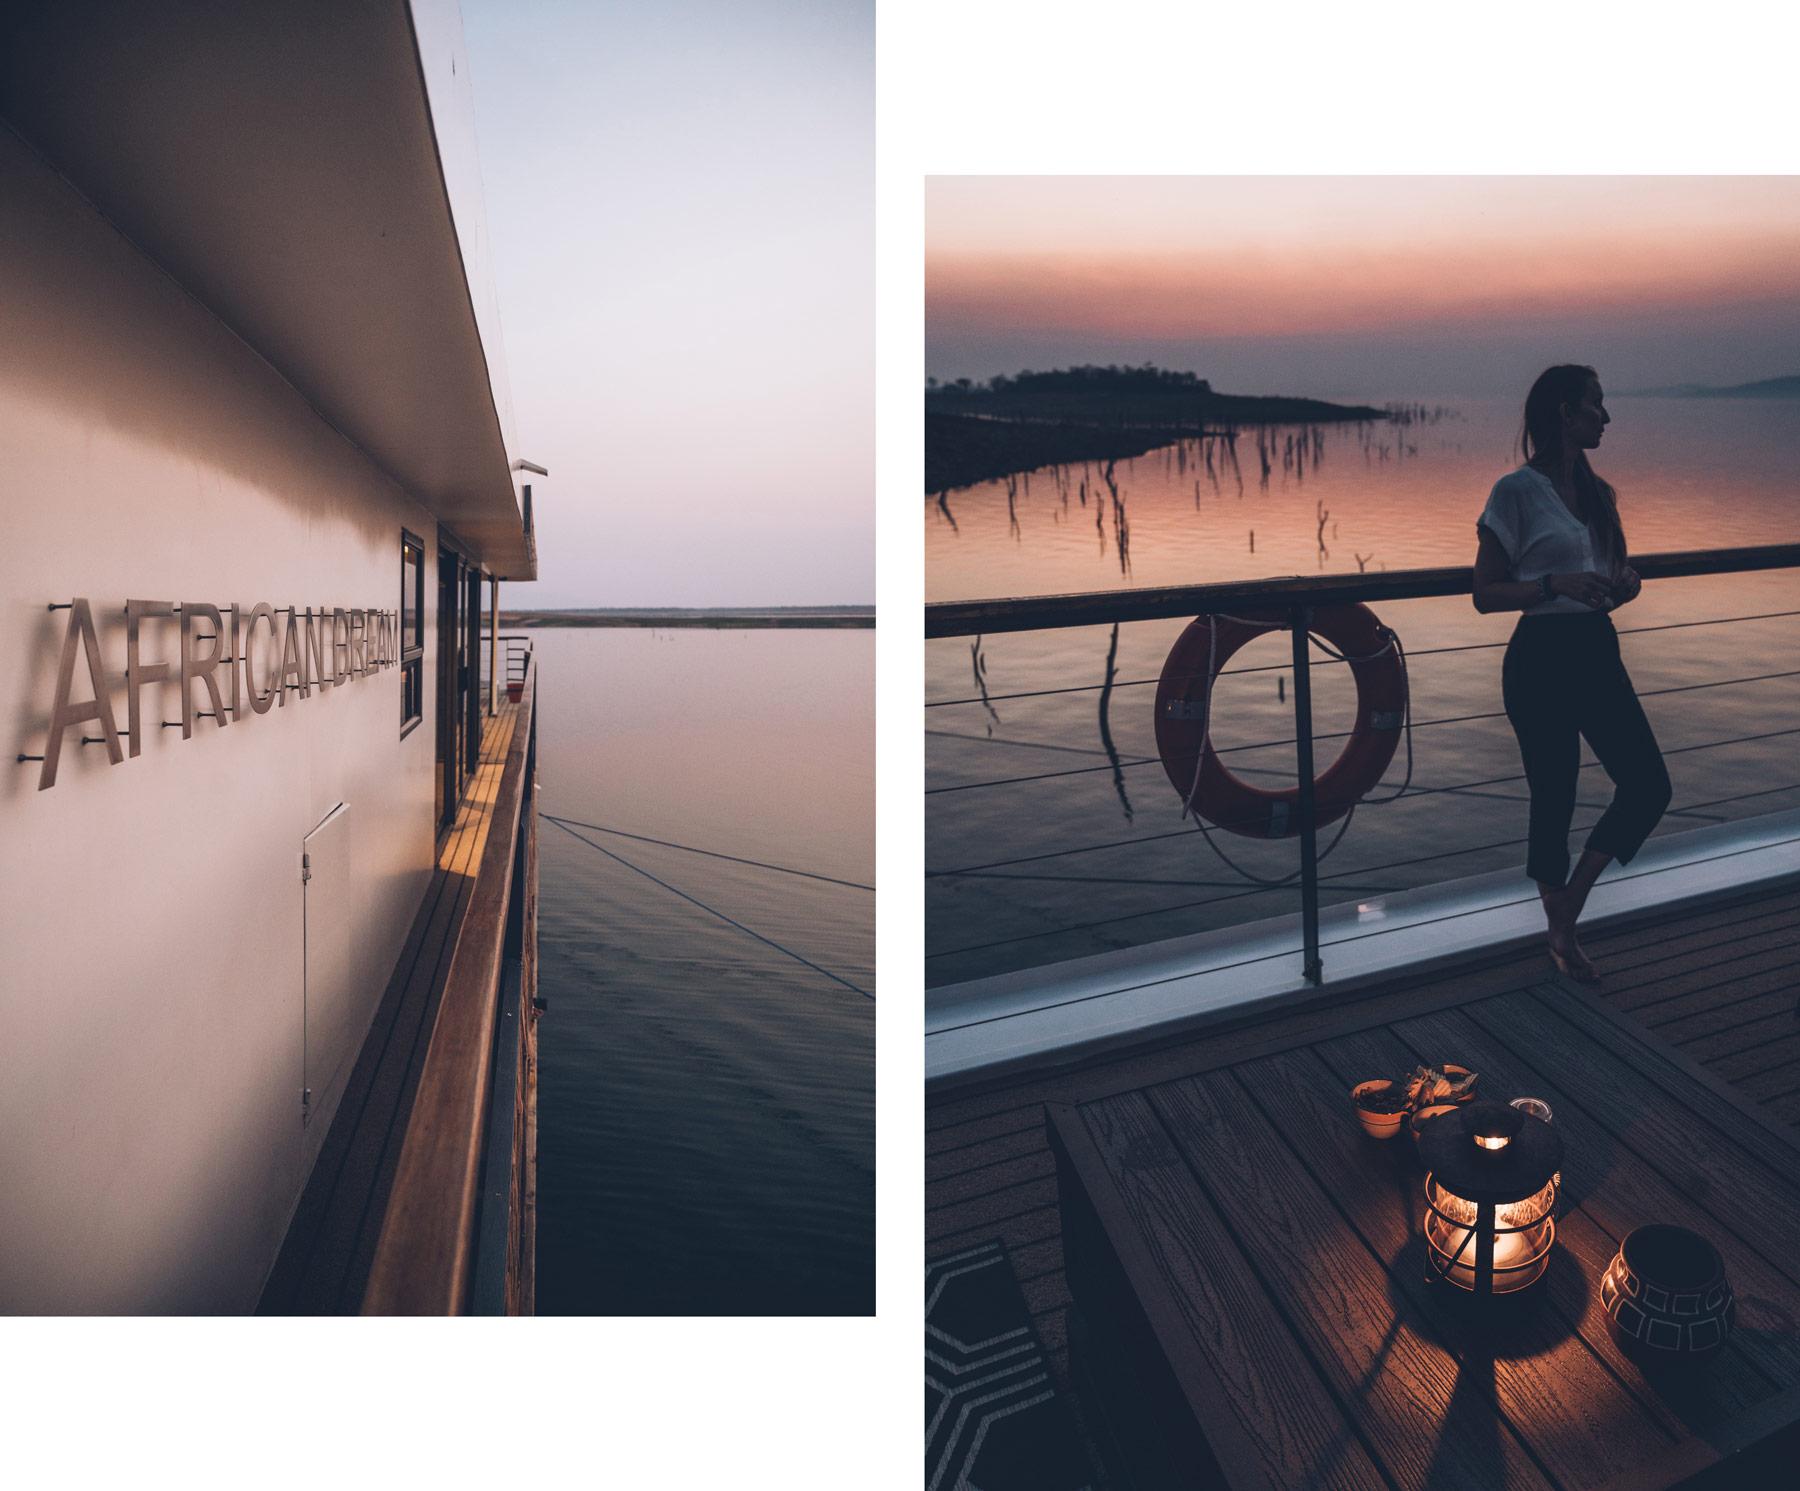 African Dream Boat, Zimbabwe